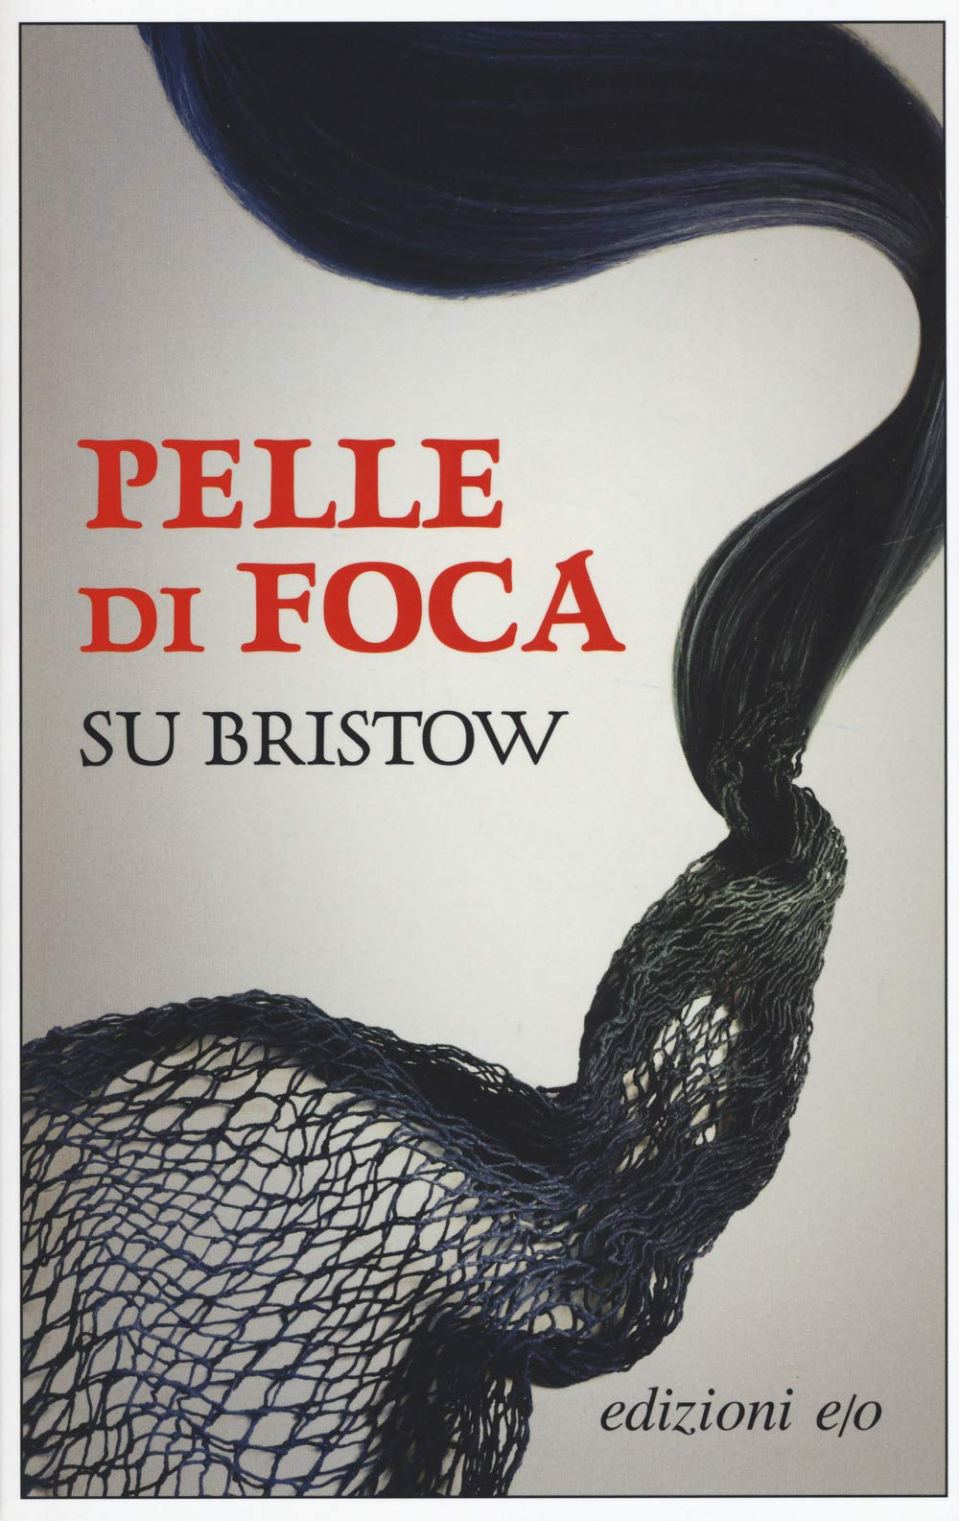 Pelle di foca Book Cover